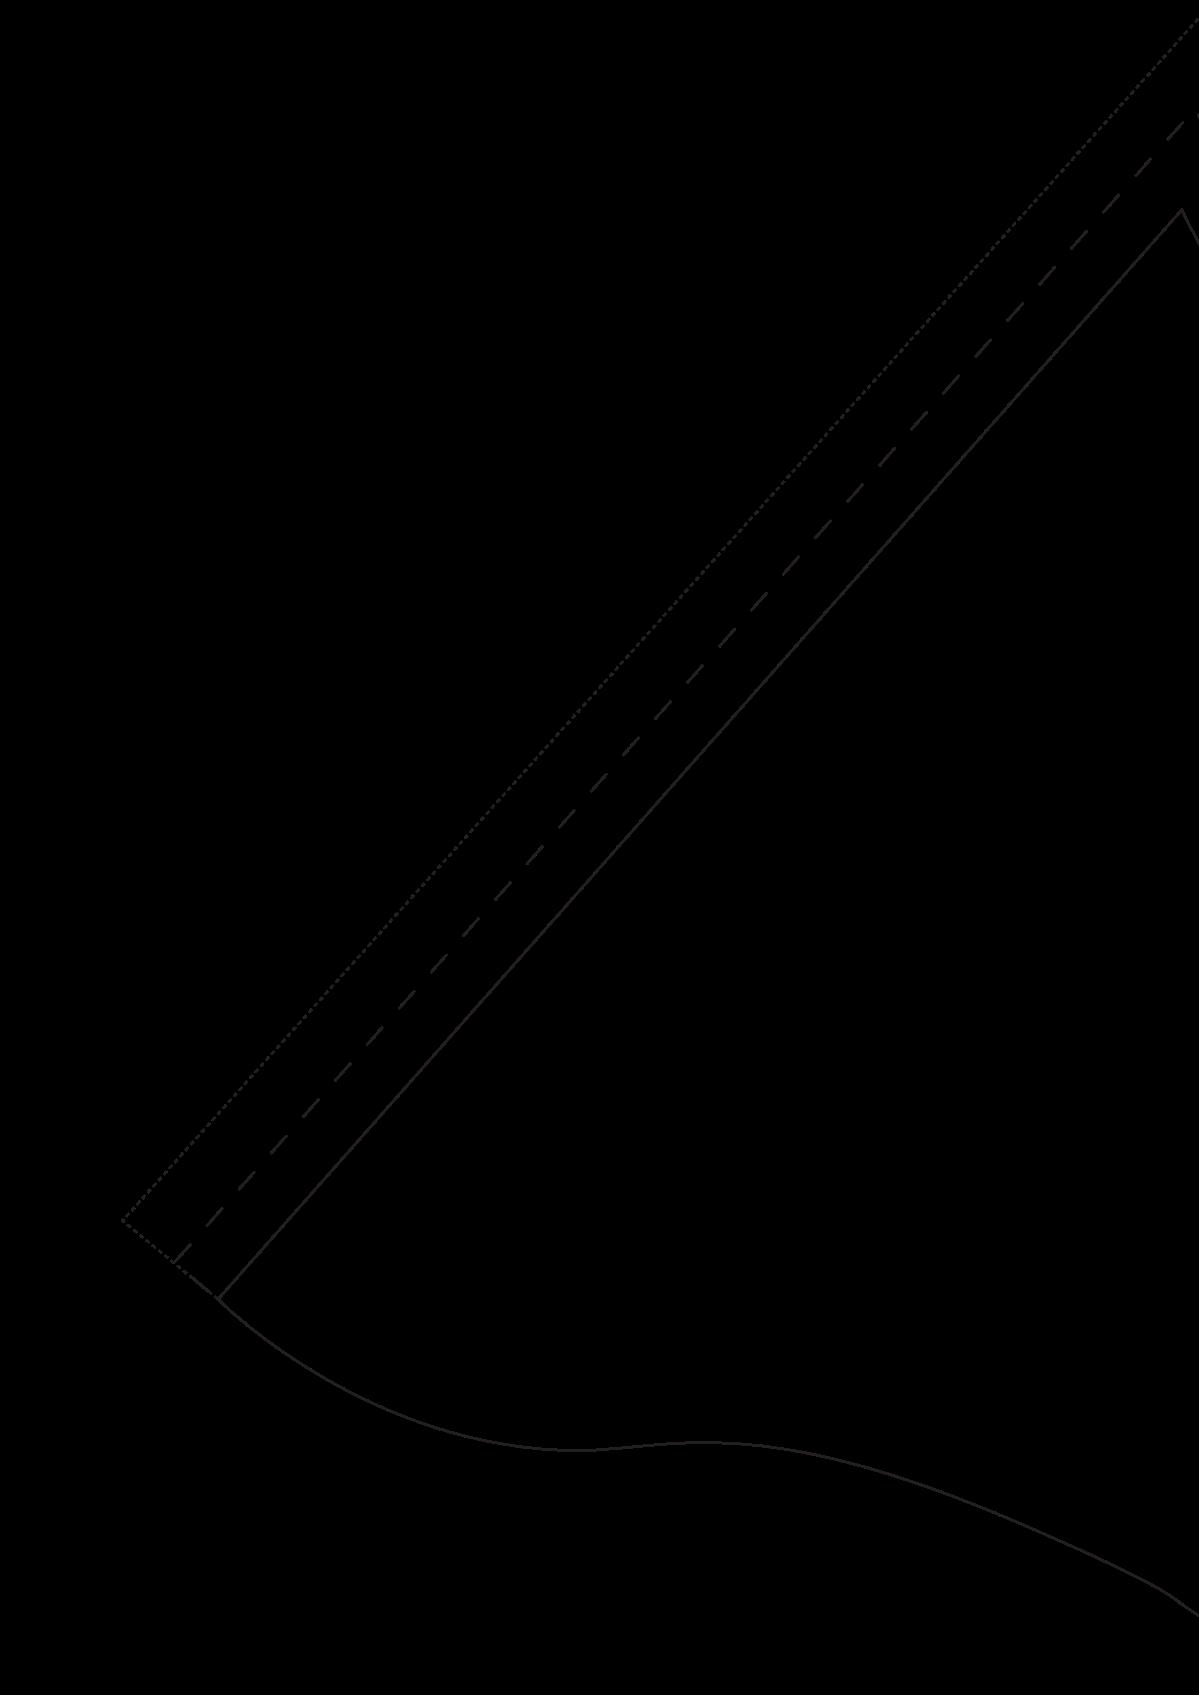 Mermaid tail sewing pattern